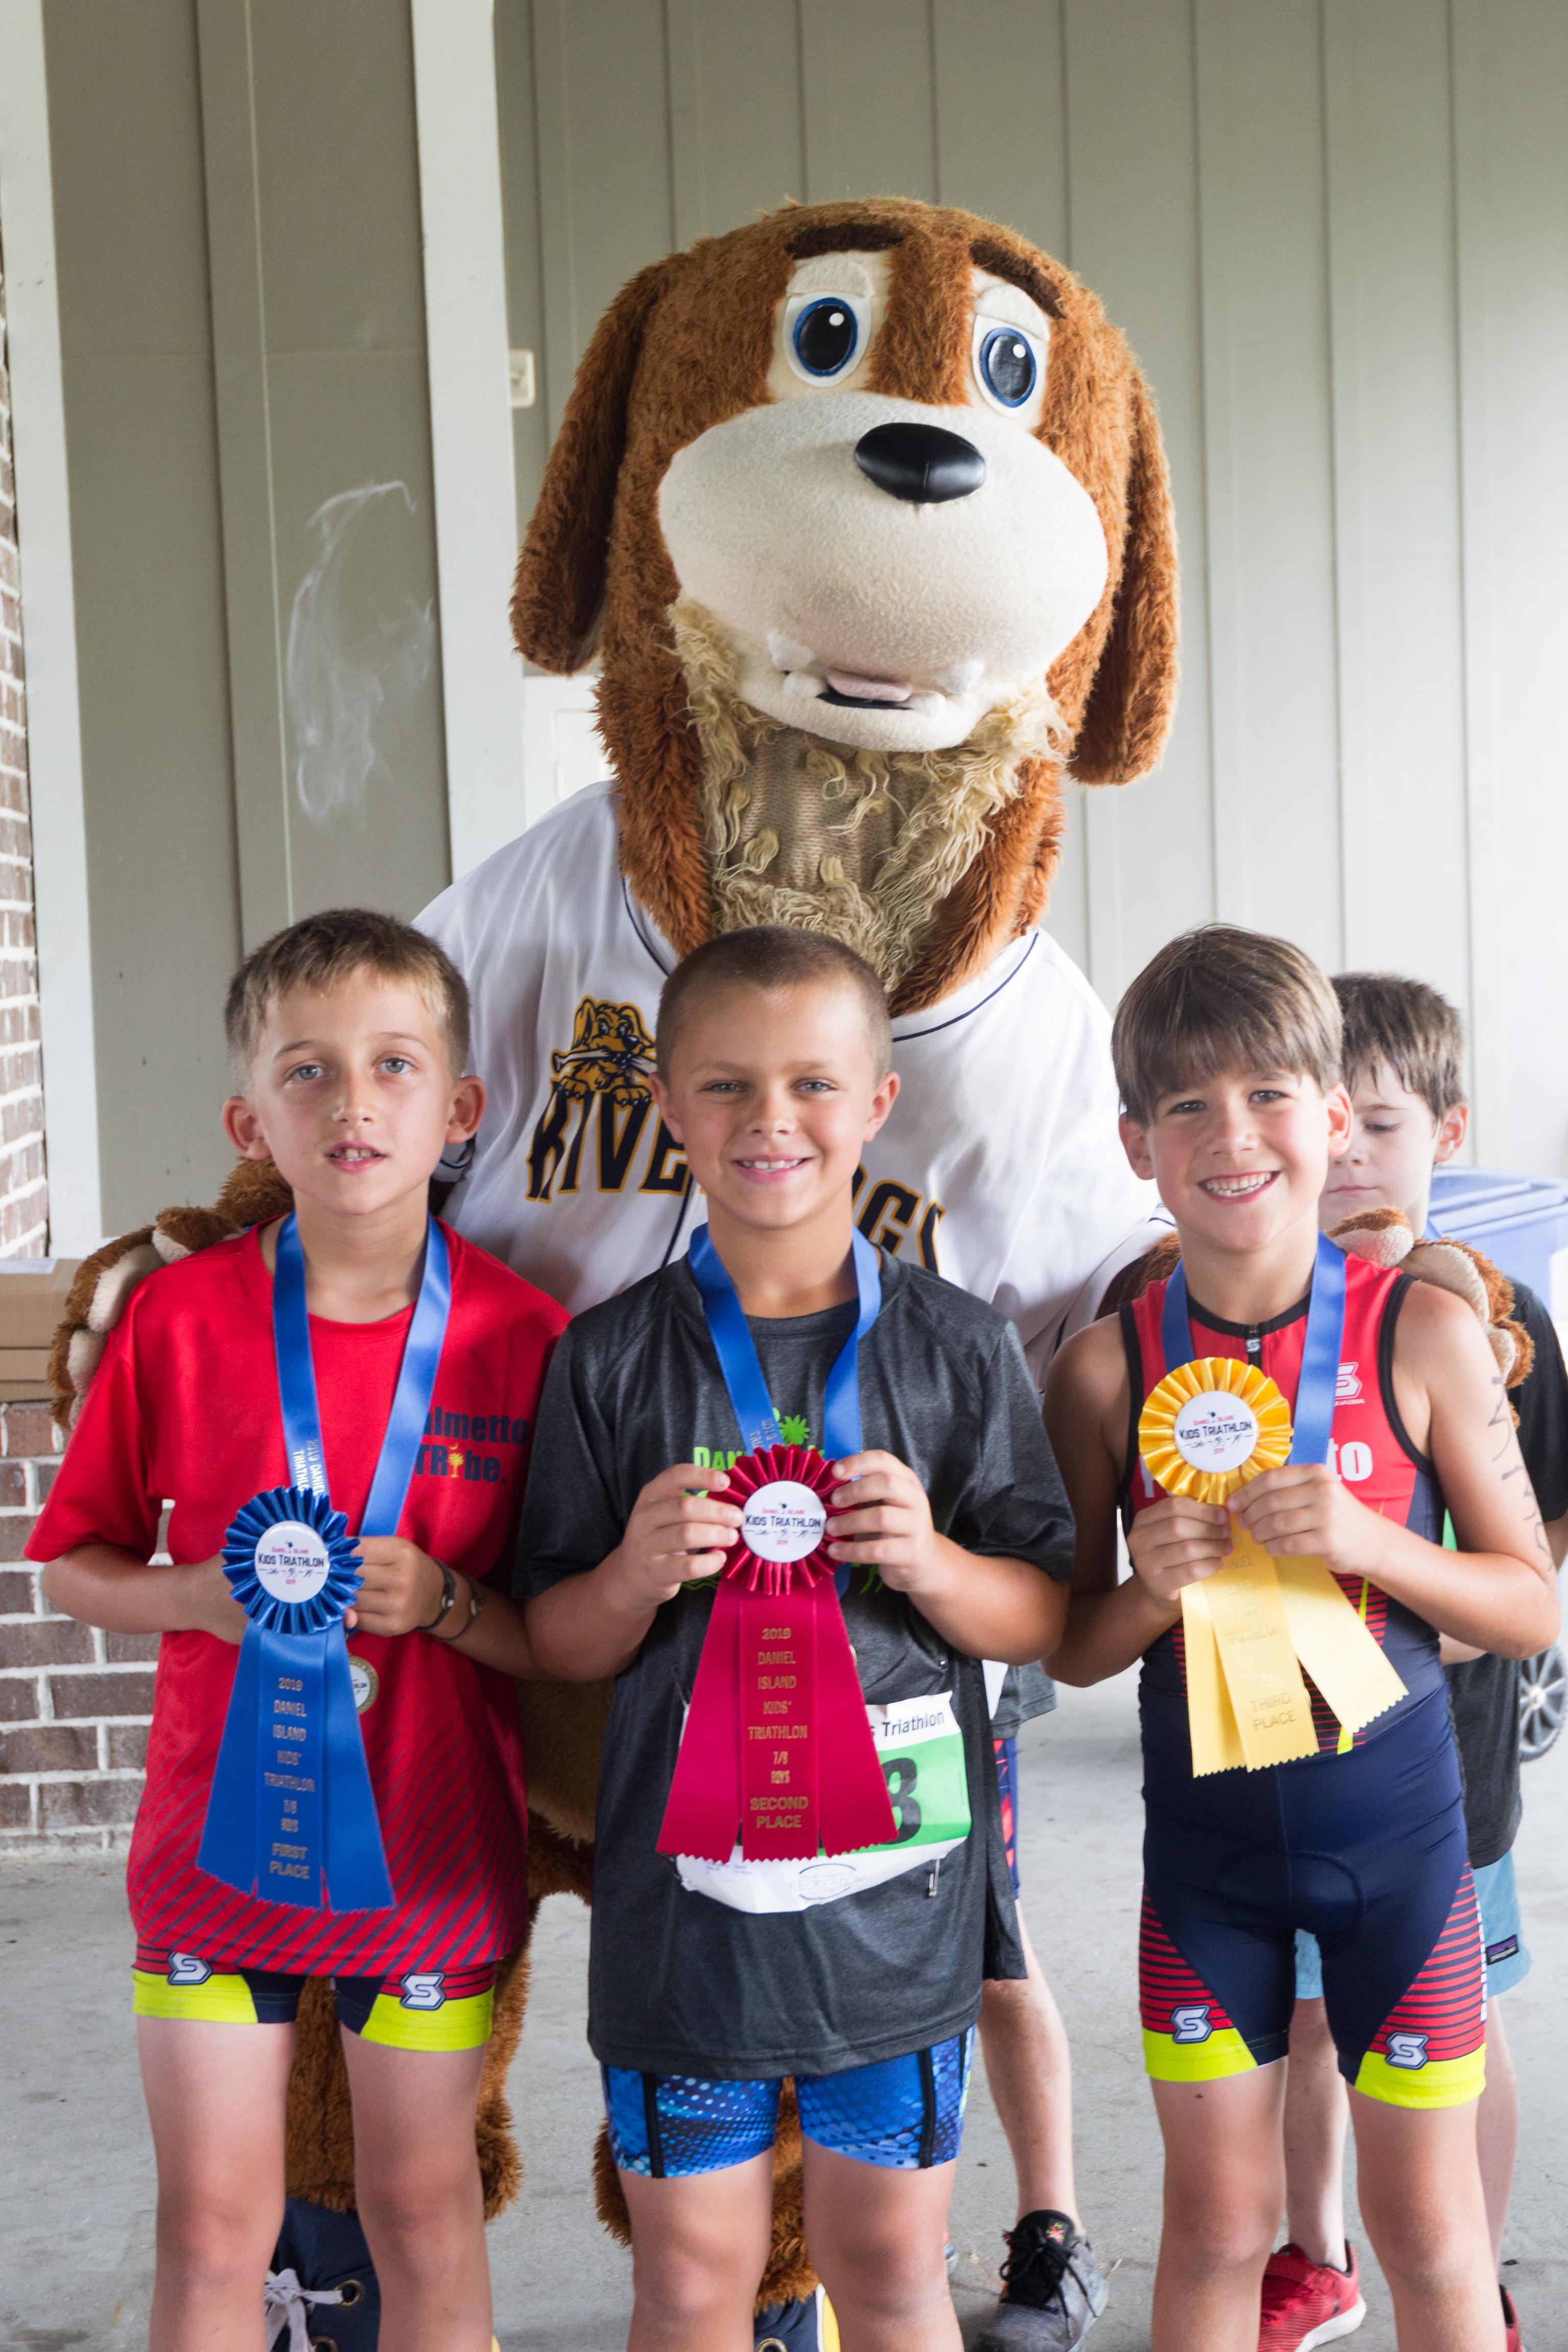 Winners in the 7-8 year-old boys' category (100 meter swim, 2.4 mile bike, ½ mile run): John Warren Cason (1st), Jason Chalupsky (2nd) and Brody Jones (3rd).